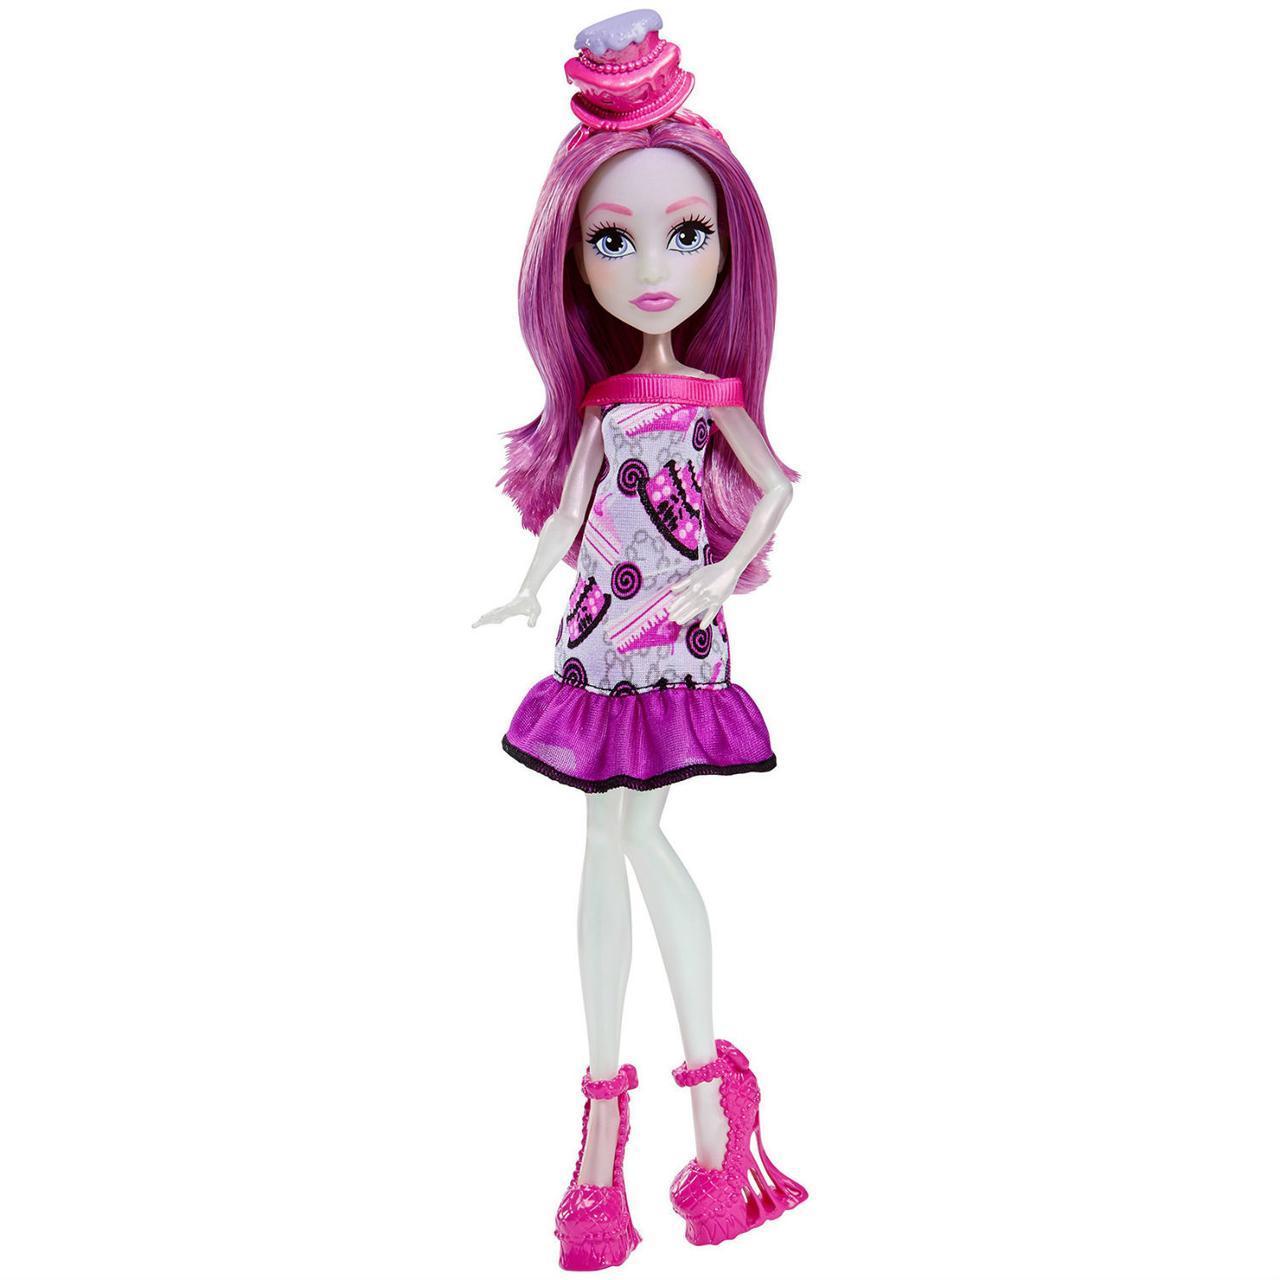 "Monster High ""Страх как сладко"" Кукла Ари Хантингтон, Монстер Хай"